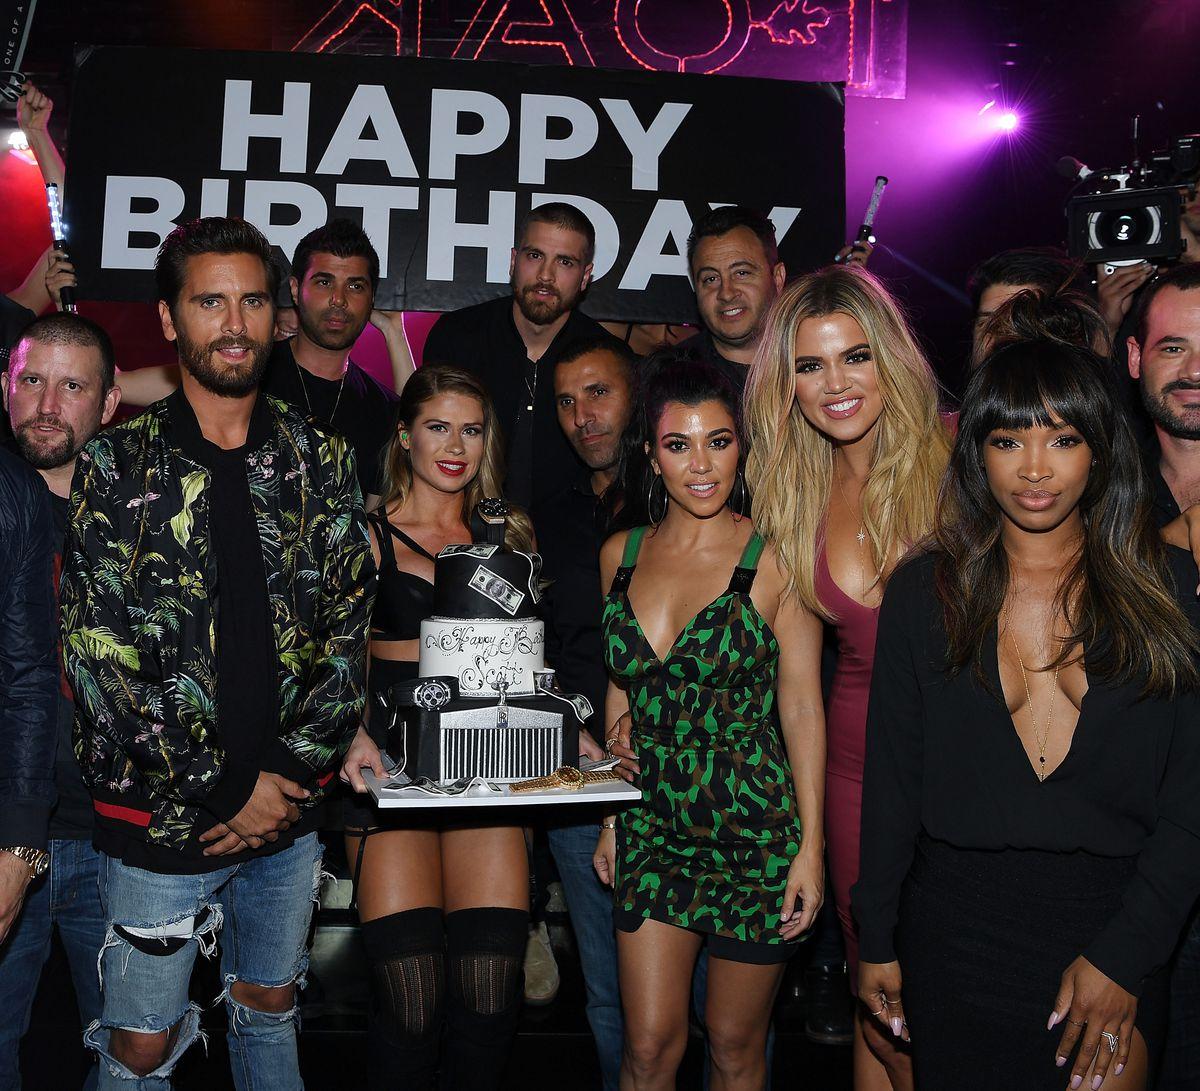 Scott Disick, Kourtney Kardashian, Khloe Kardashian & Malika Haqq